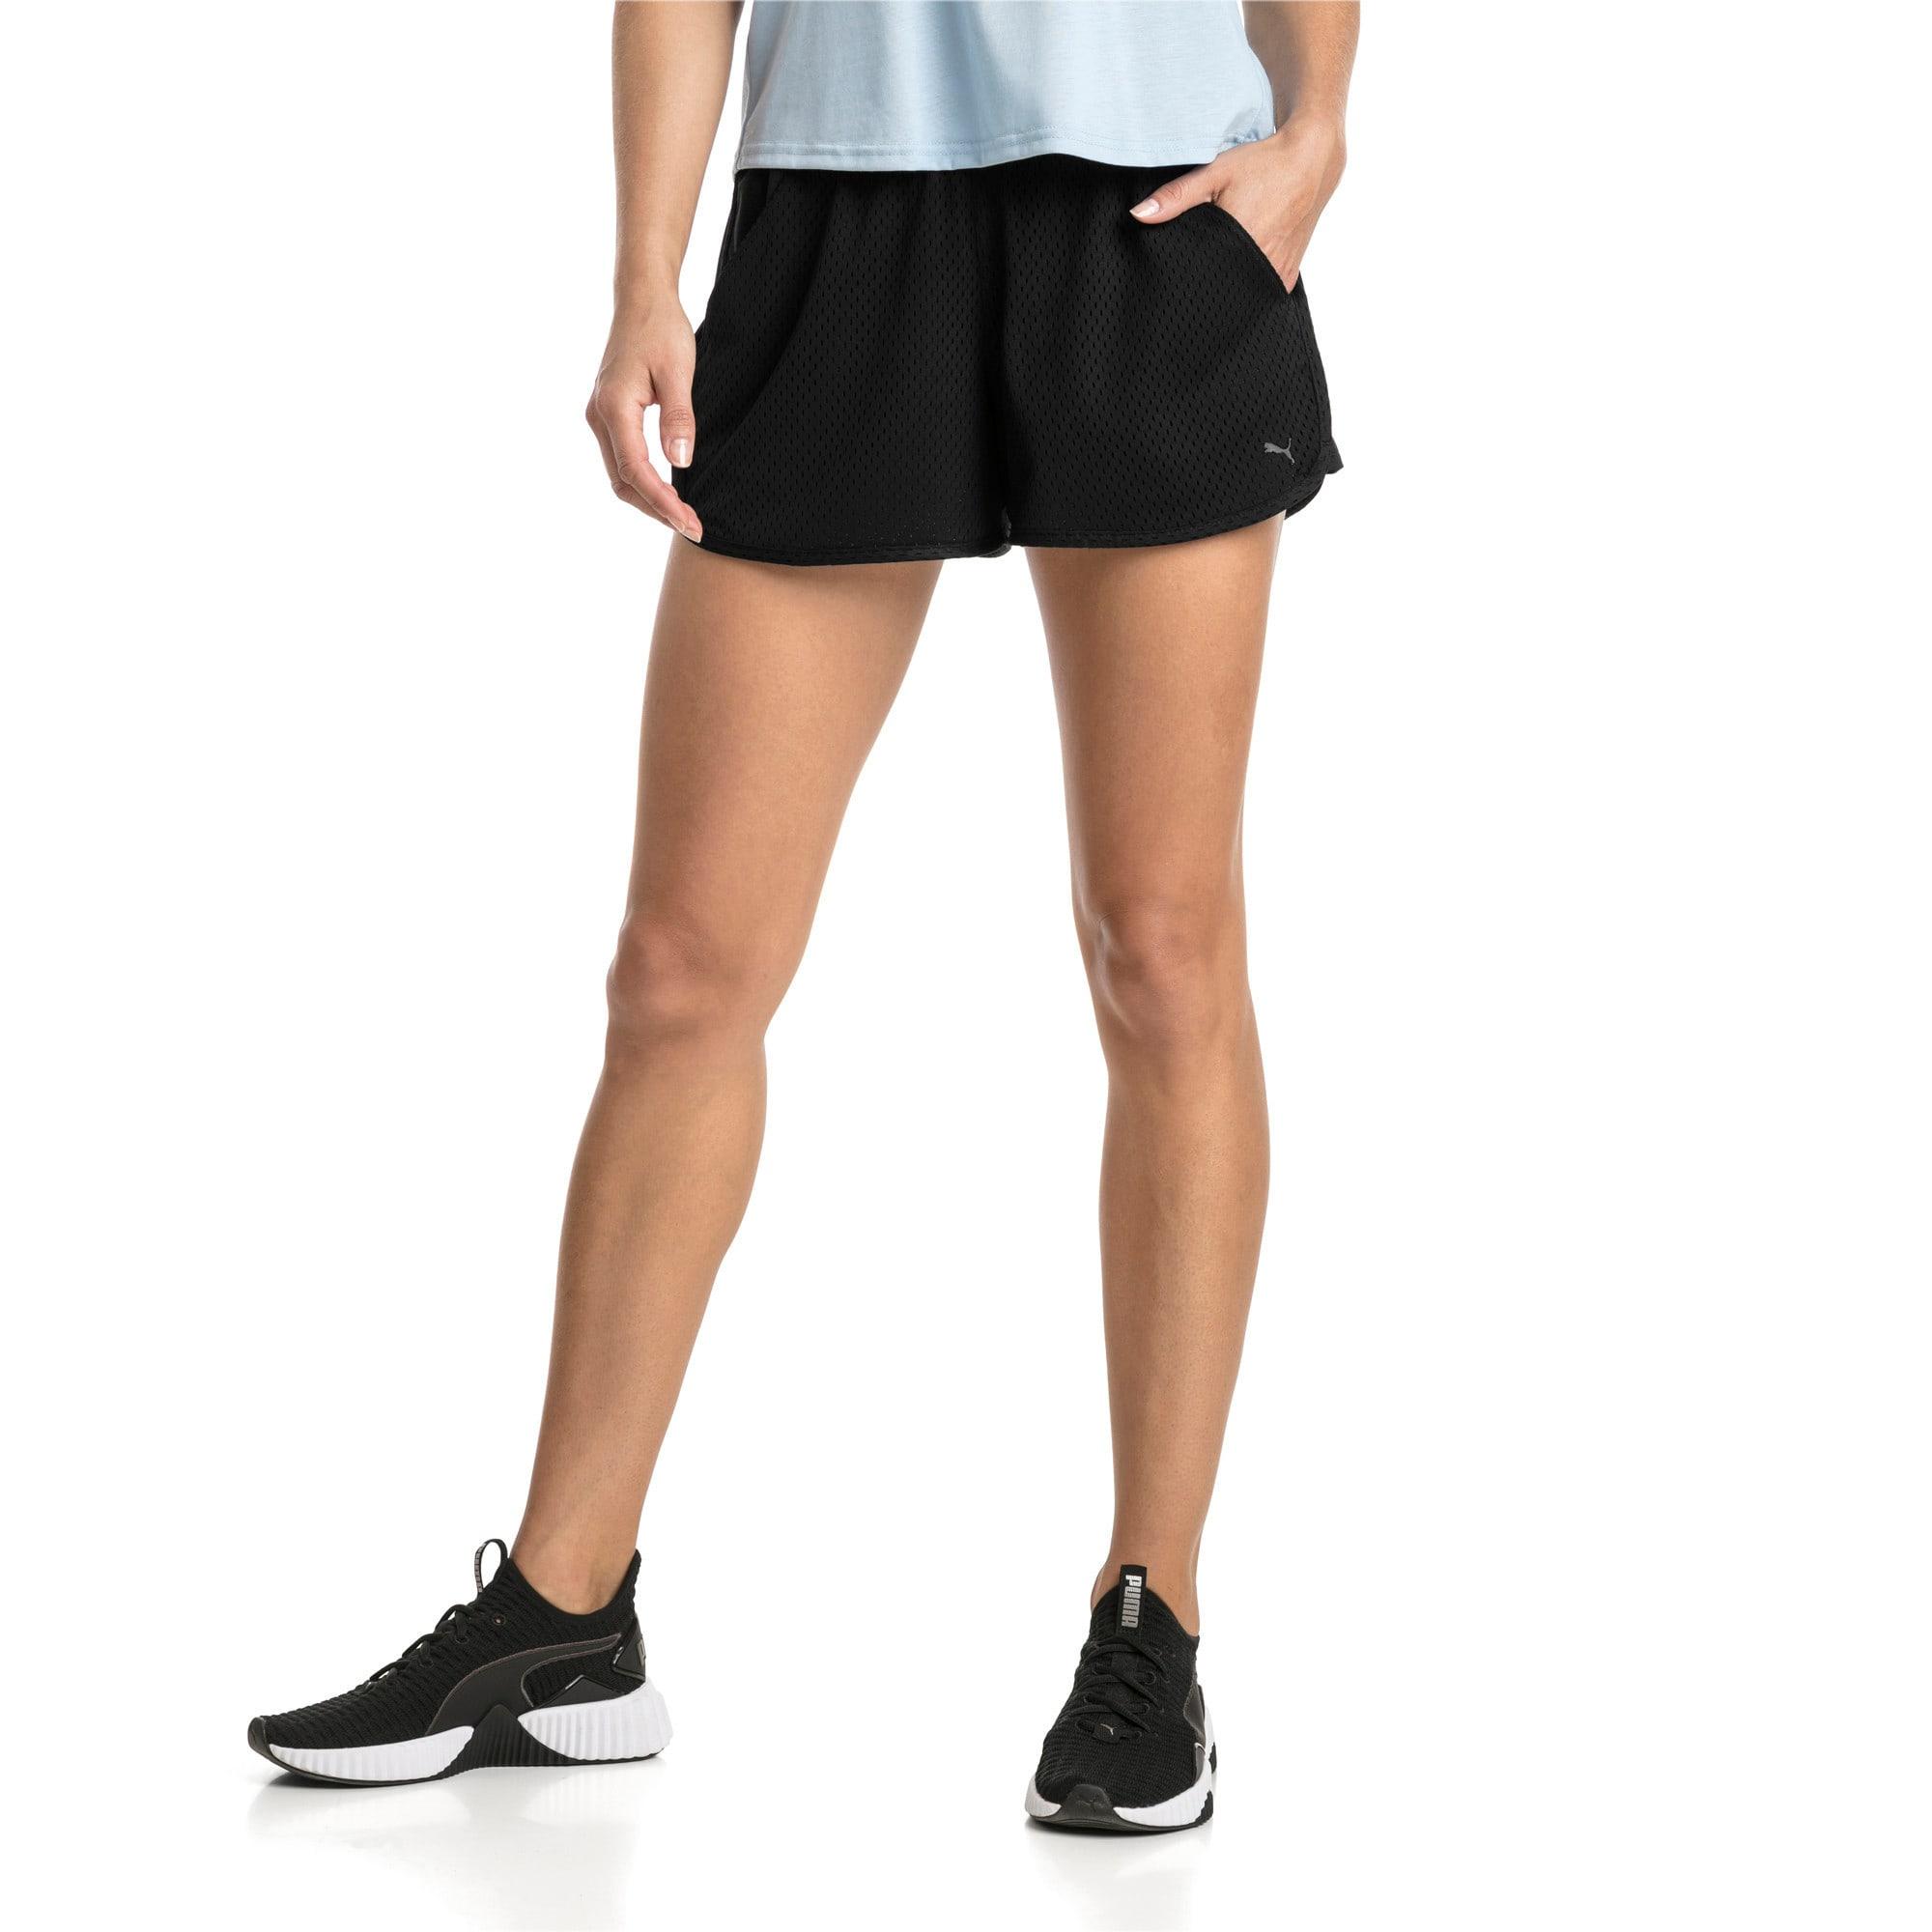 Thumbnail 1 of A.C.E. Mesh Women's Shorts, Puma Black, medium-IND